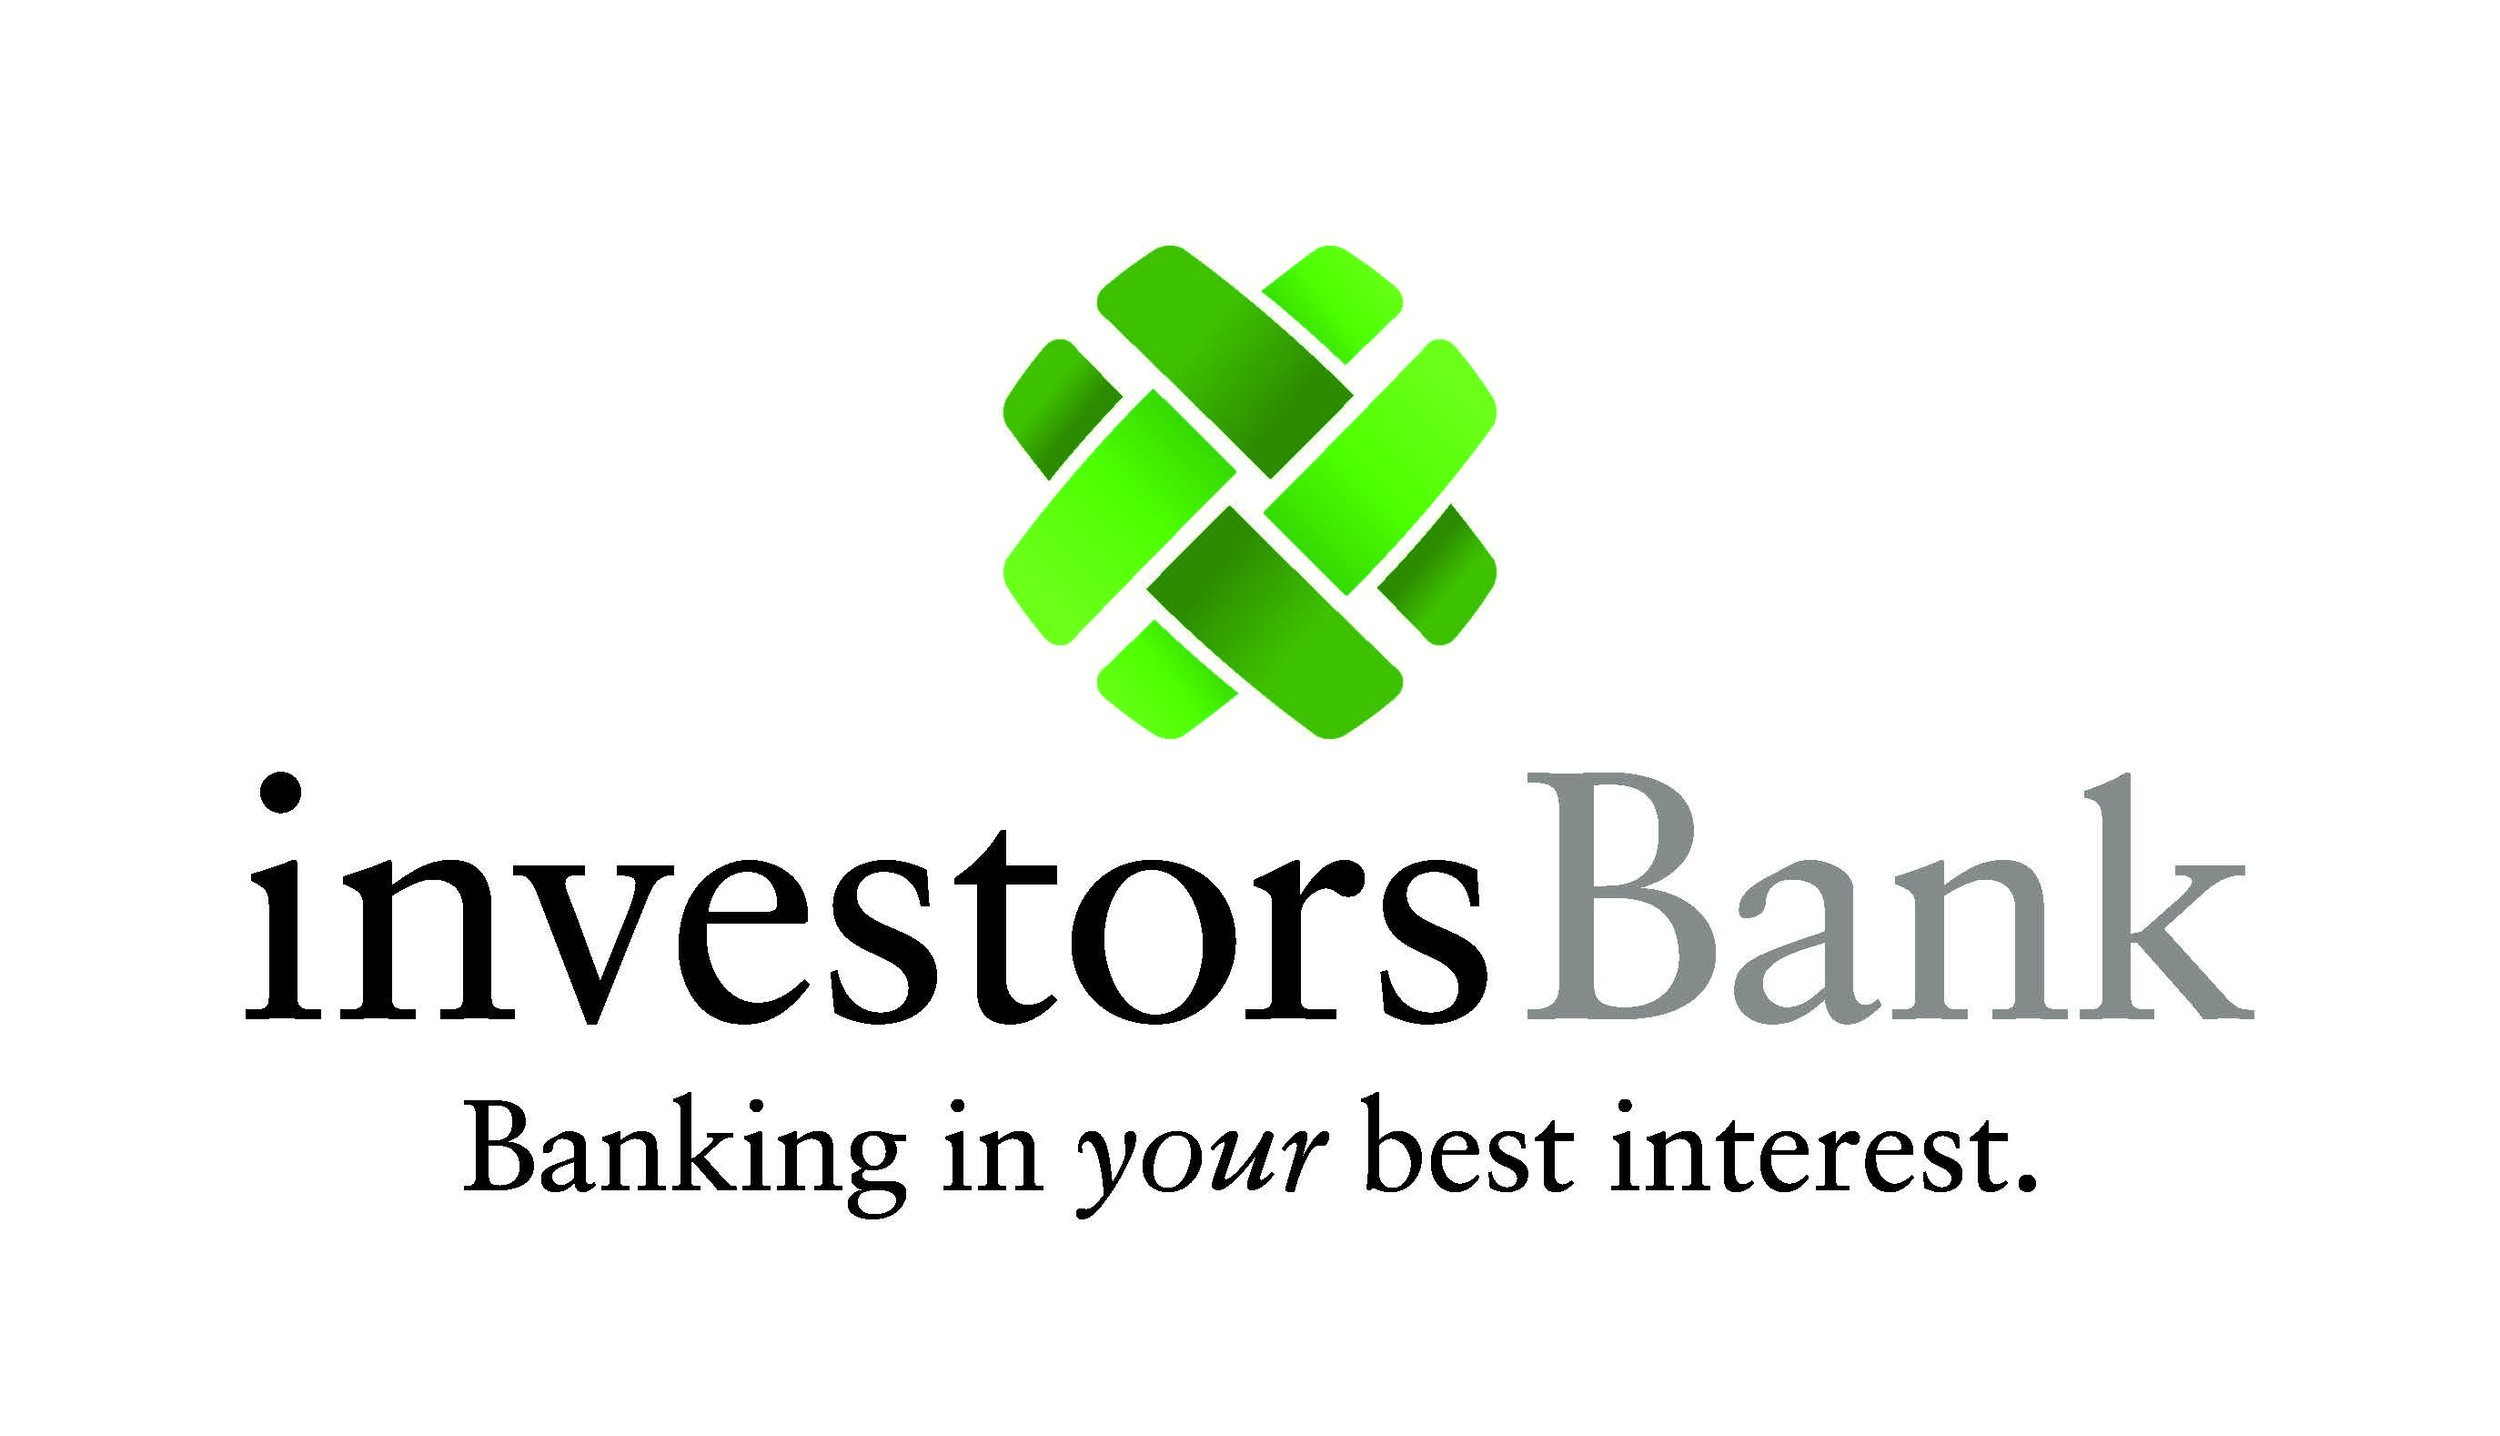 Investors Bank's logo-1 - Copy.jpg